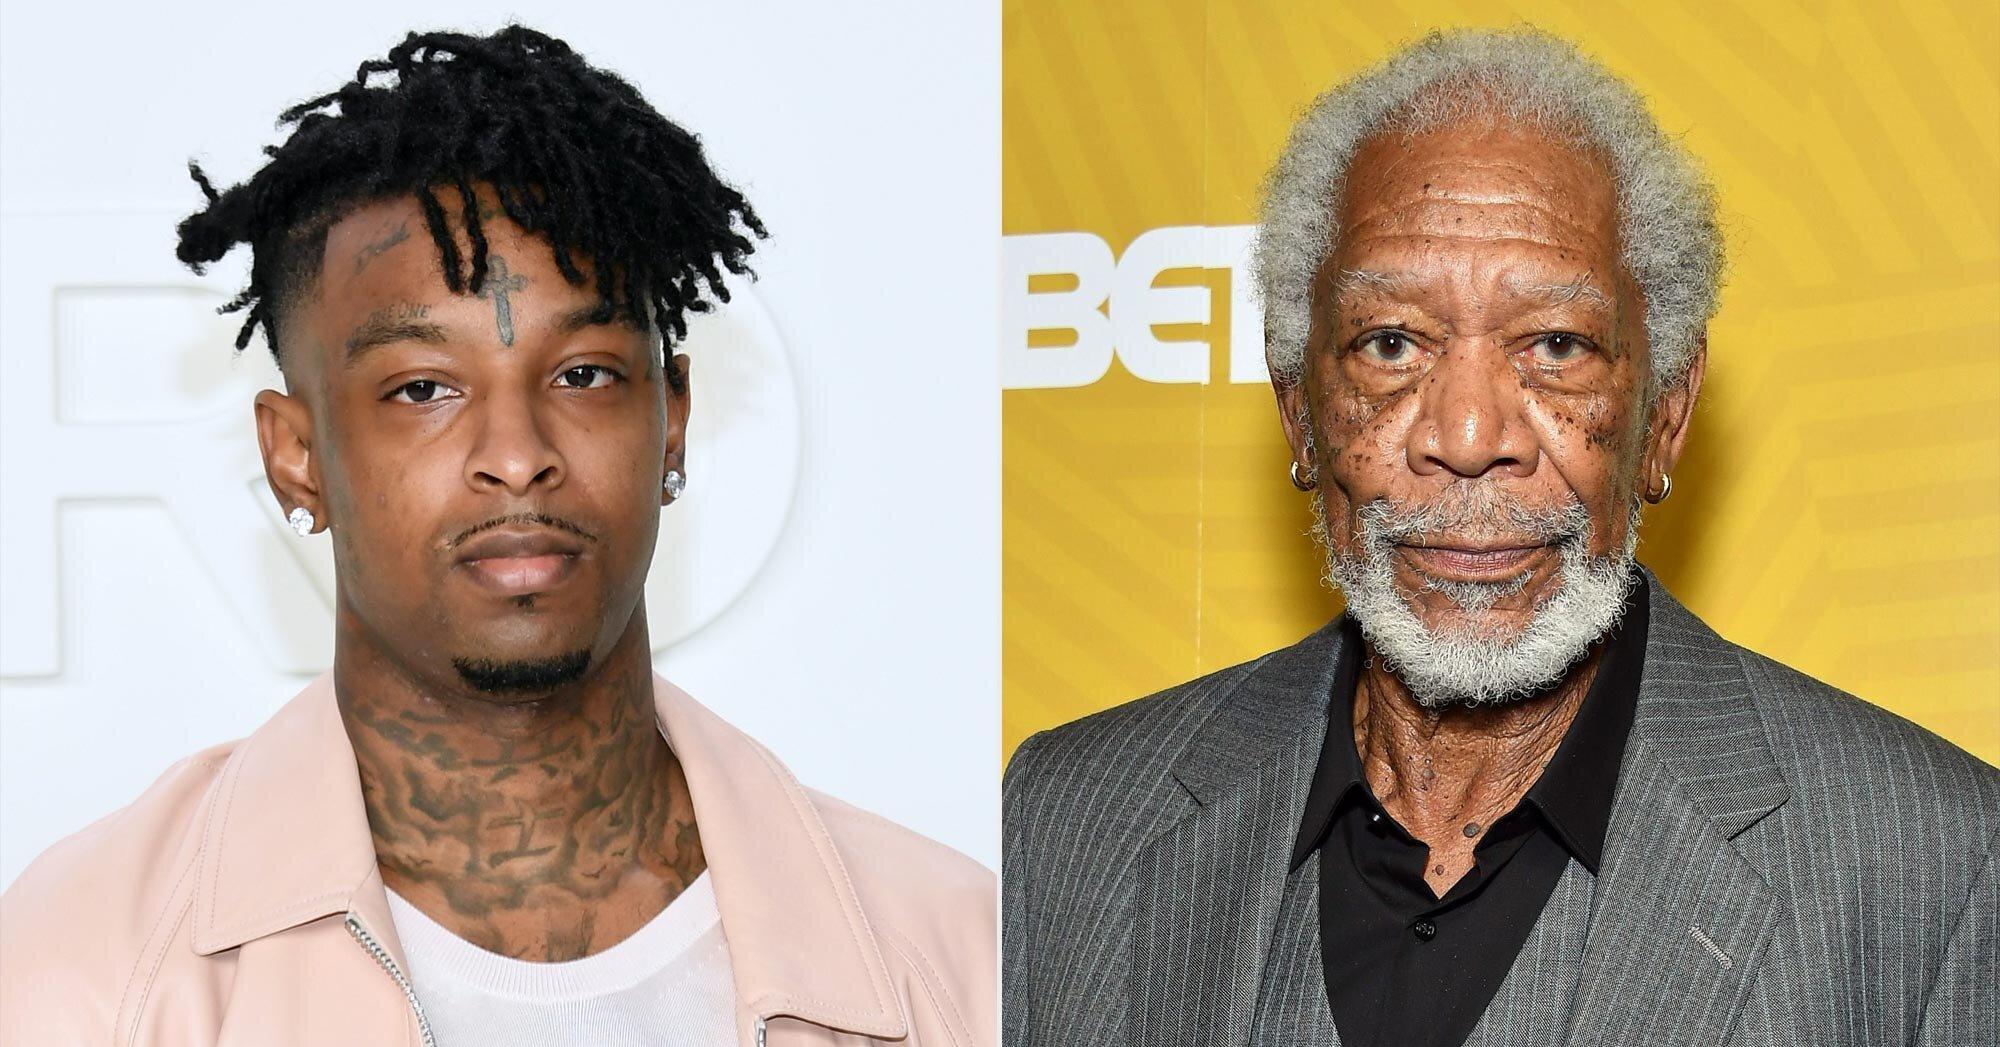 Morgan Freeman Narrates Trailer For Upcoming 21 Savage Album Ew Com